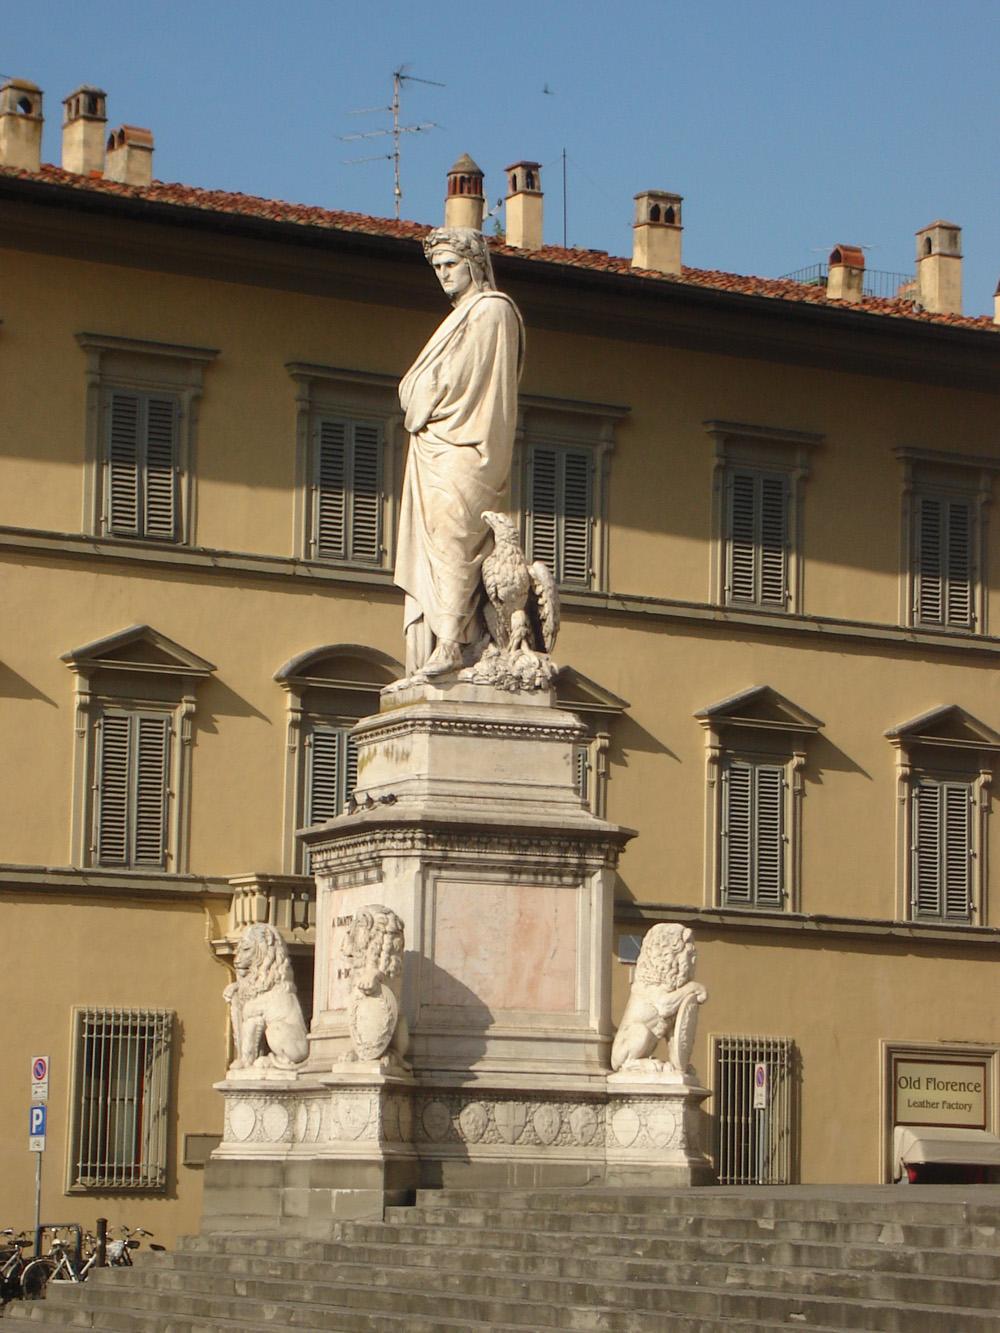 Статуя Данте у базилики Санта-Кроче, Флоренция, где установлен кенотаф поэта